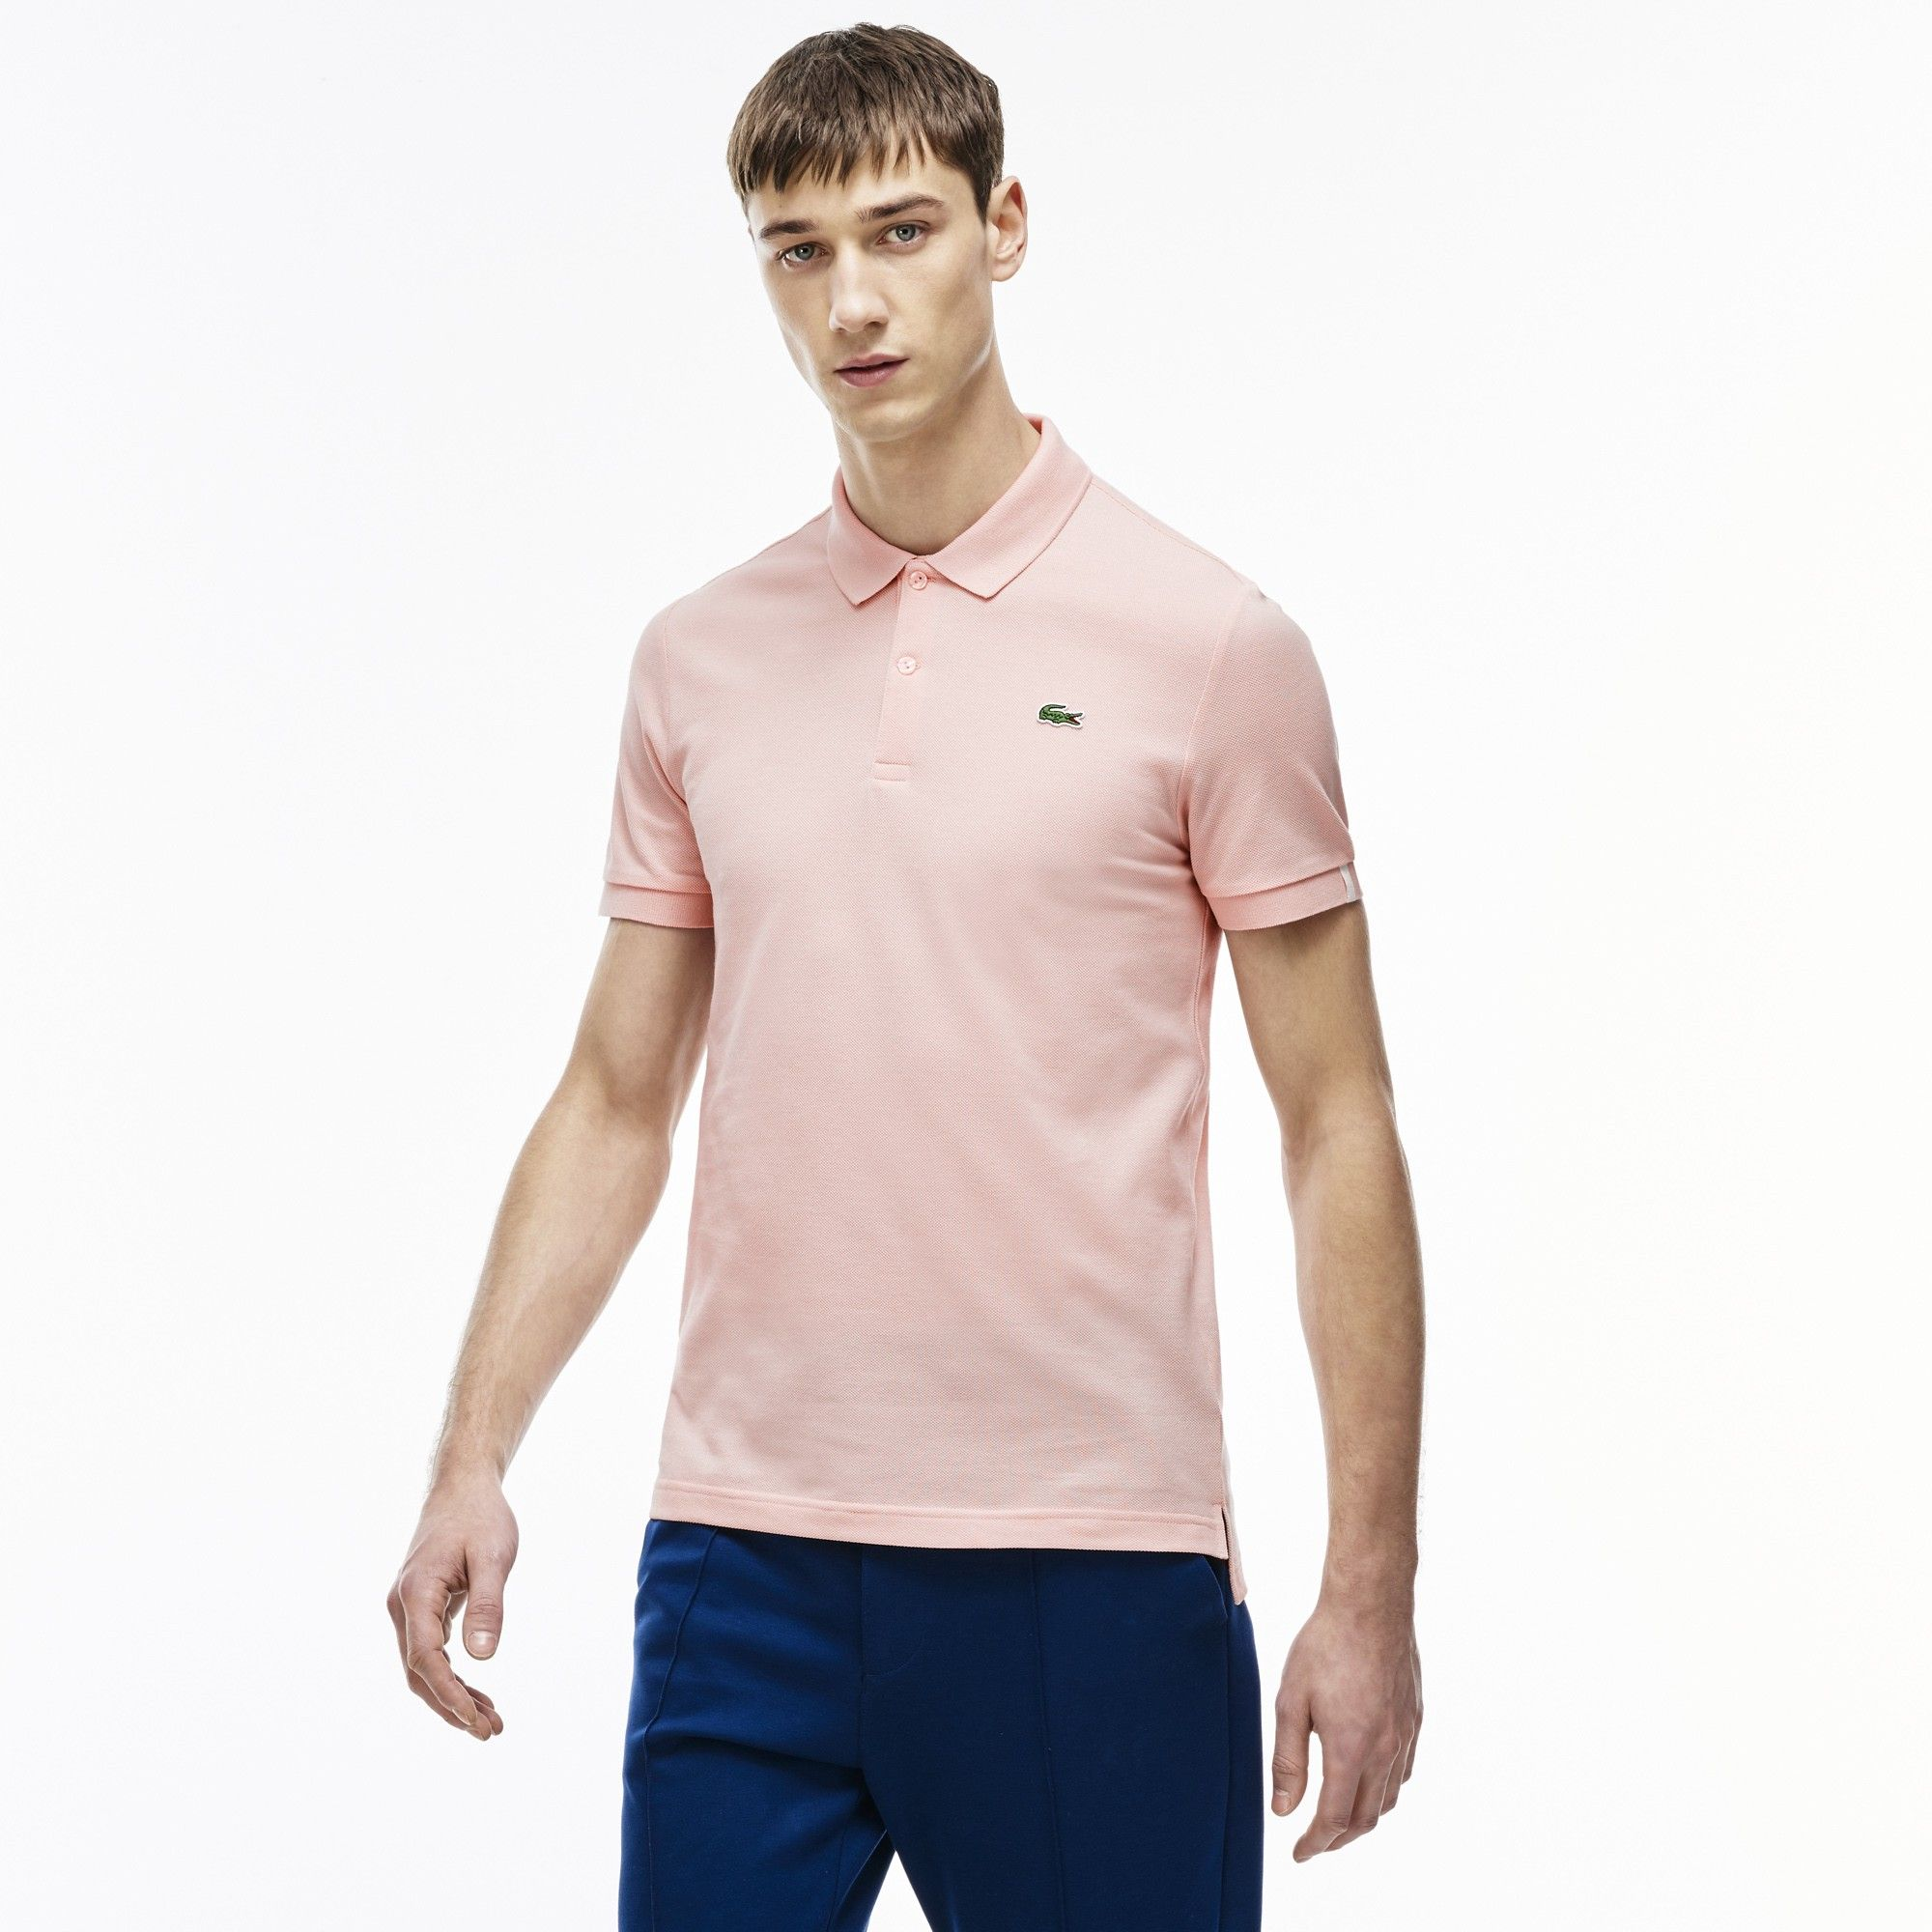 9fba2b05af182 LACOSTE Unisex L!VE Ultra Slim Fit Piqué Polo Shirt - lychee pink.  lacoste   cloth